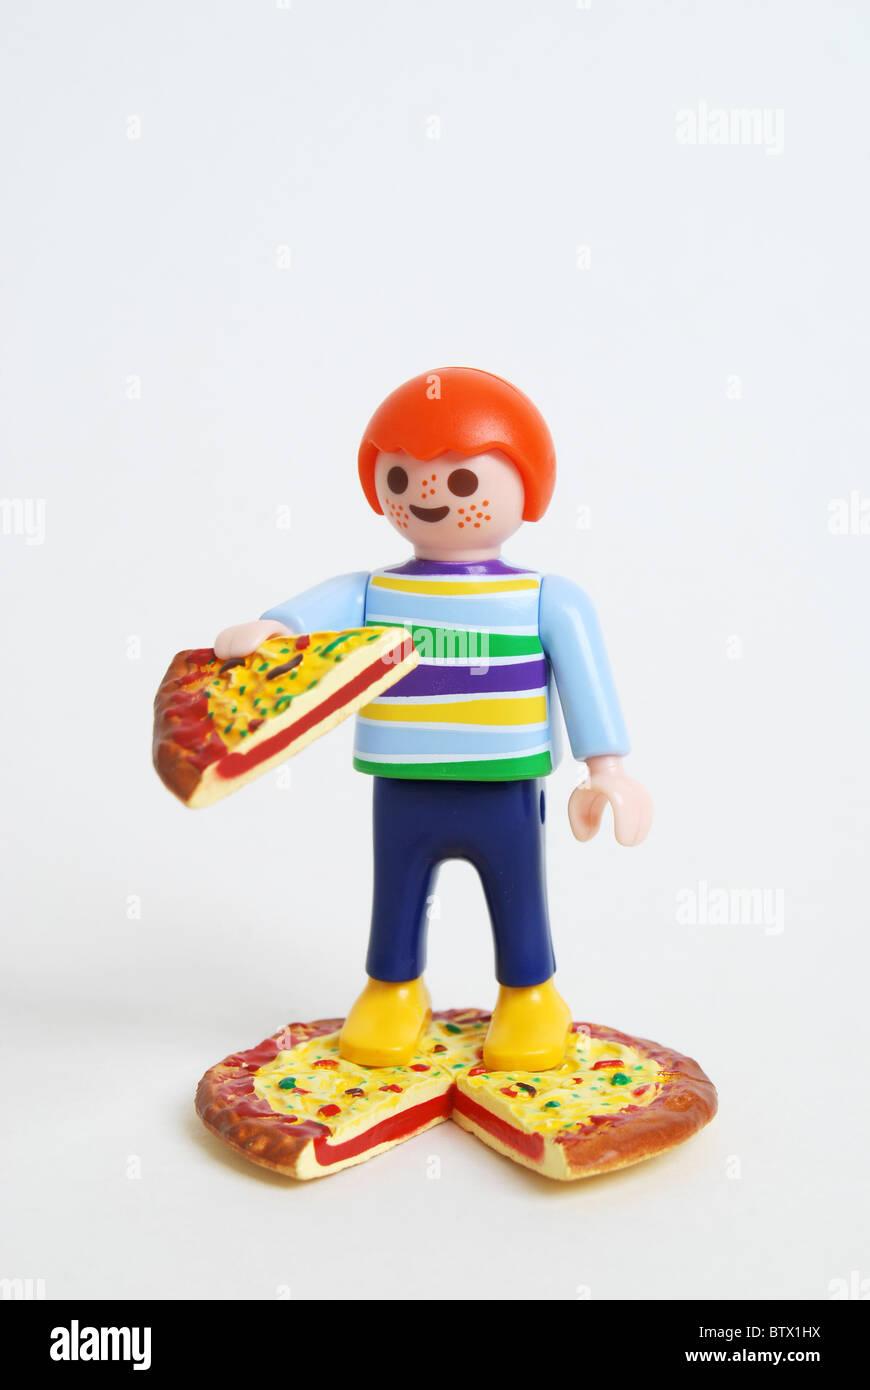 Fast Food Obesity Children Obesity Childre...